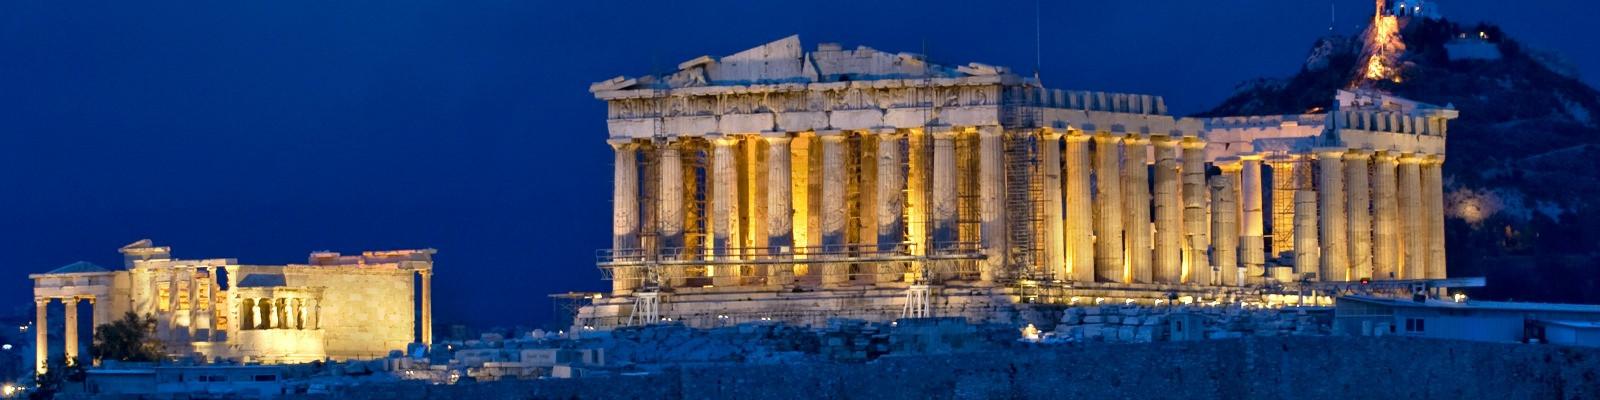 Individuelle Europa-Reisen & Europa-Urlaub